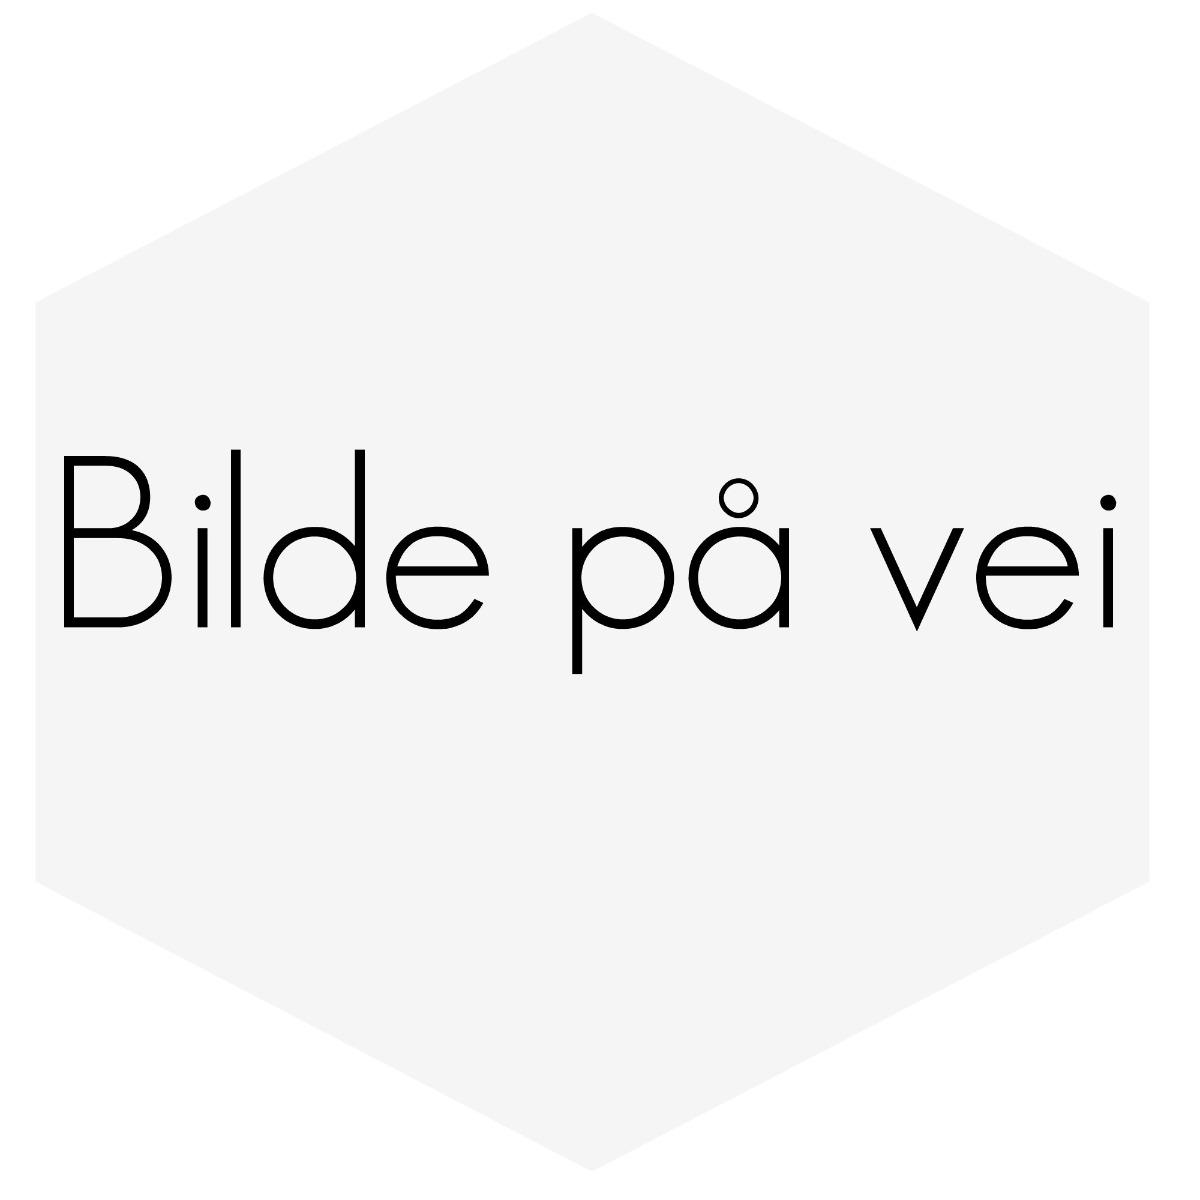 "SILIKONSLANGE RØD REDUSERING 2,375-2,5"" (60-63MM)"